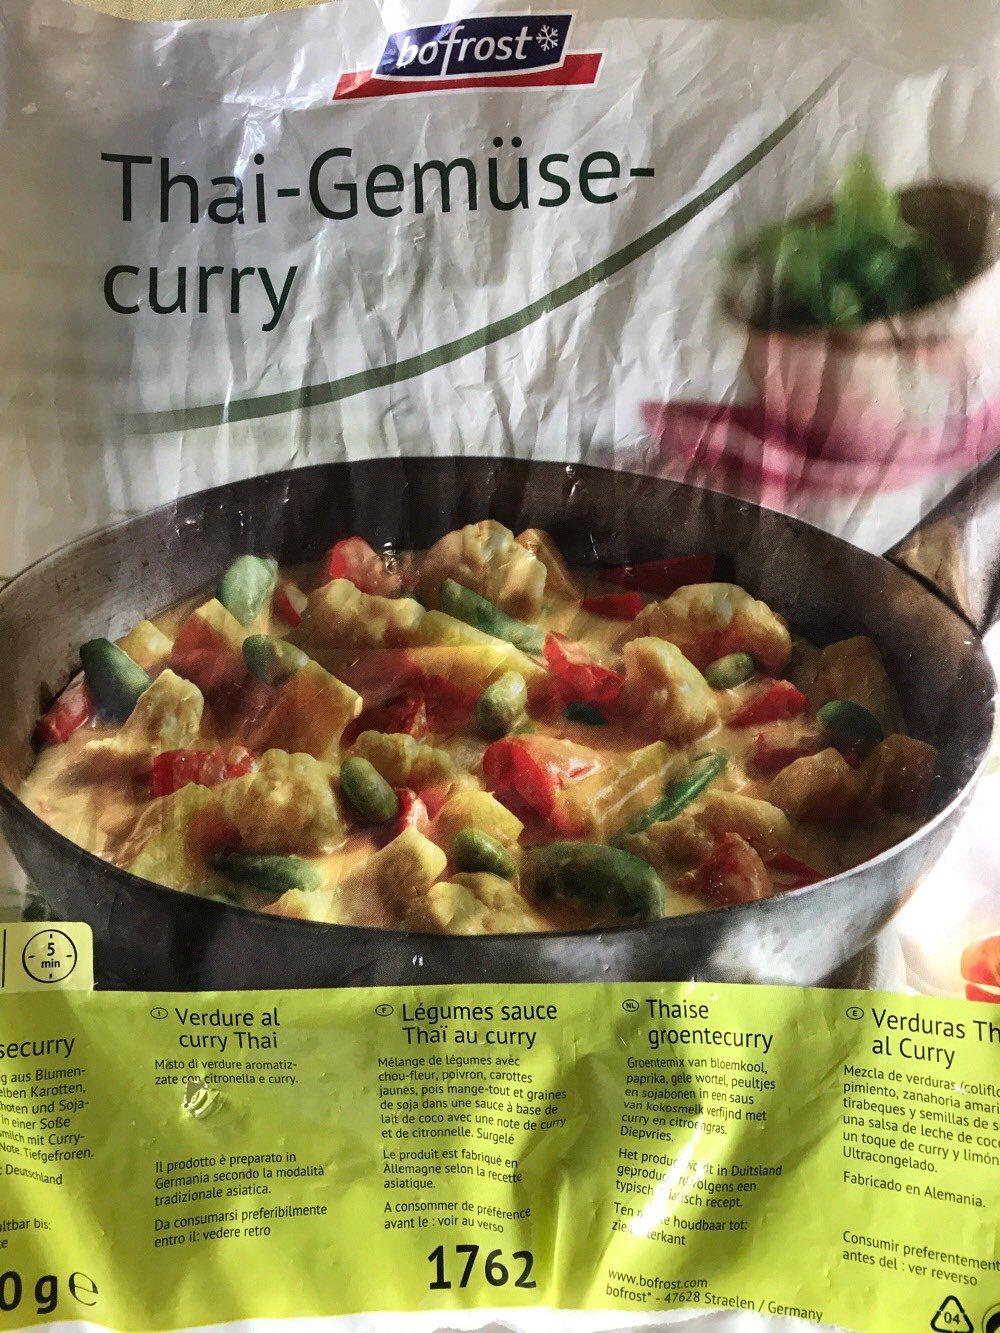 Thai Gemuse Curry Bofrost 1000 G